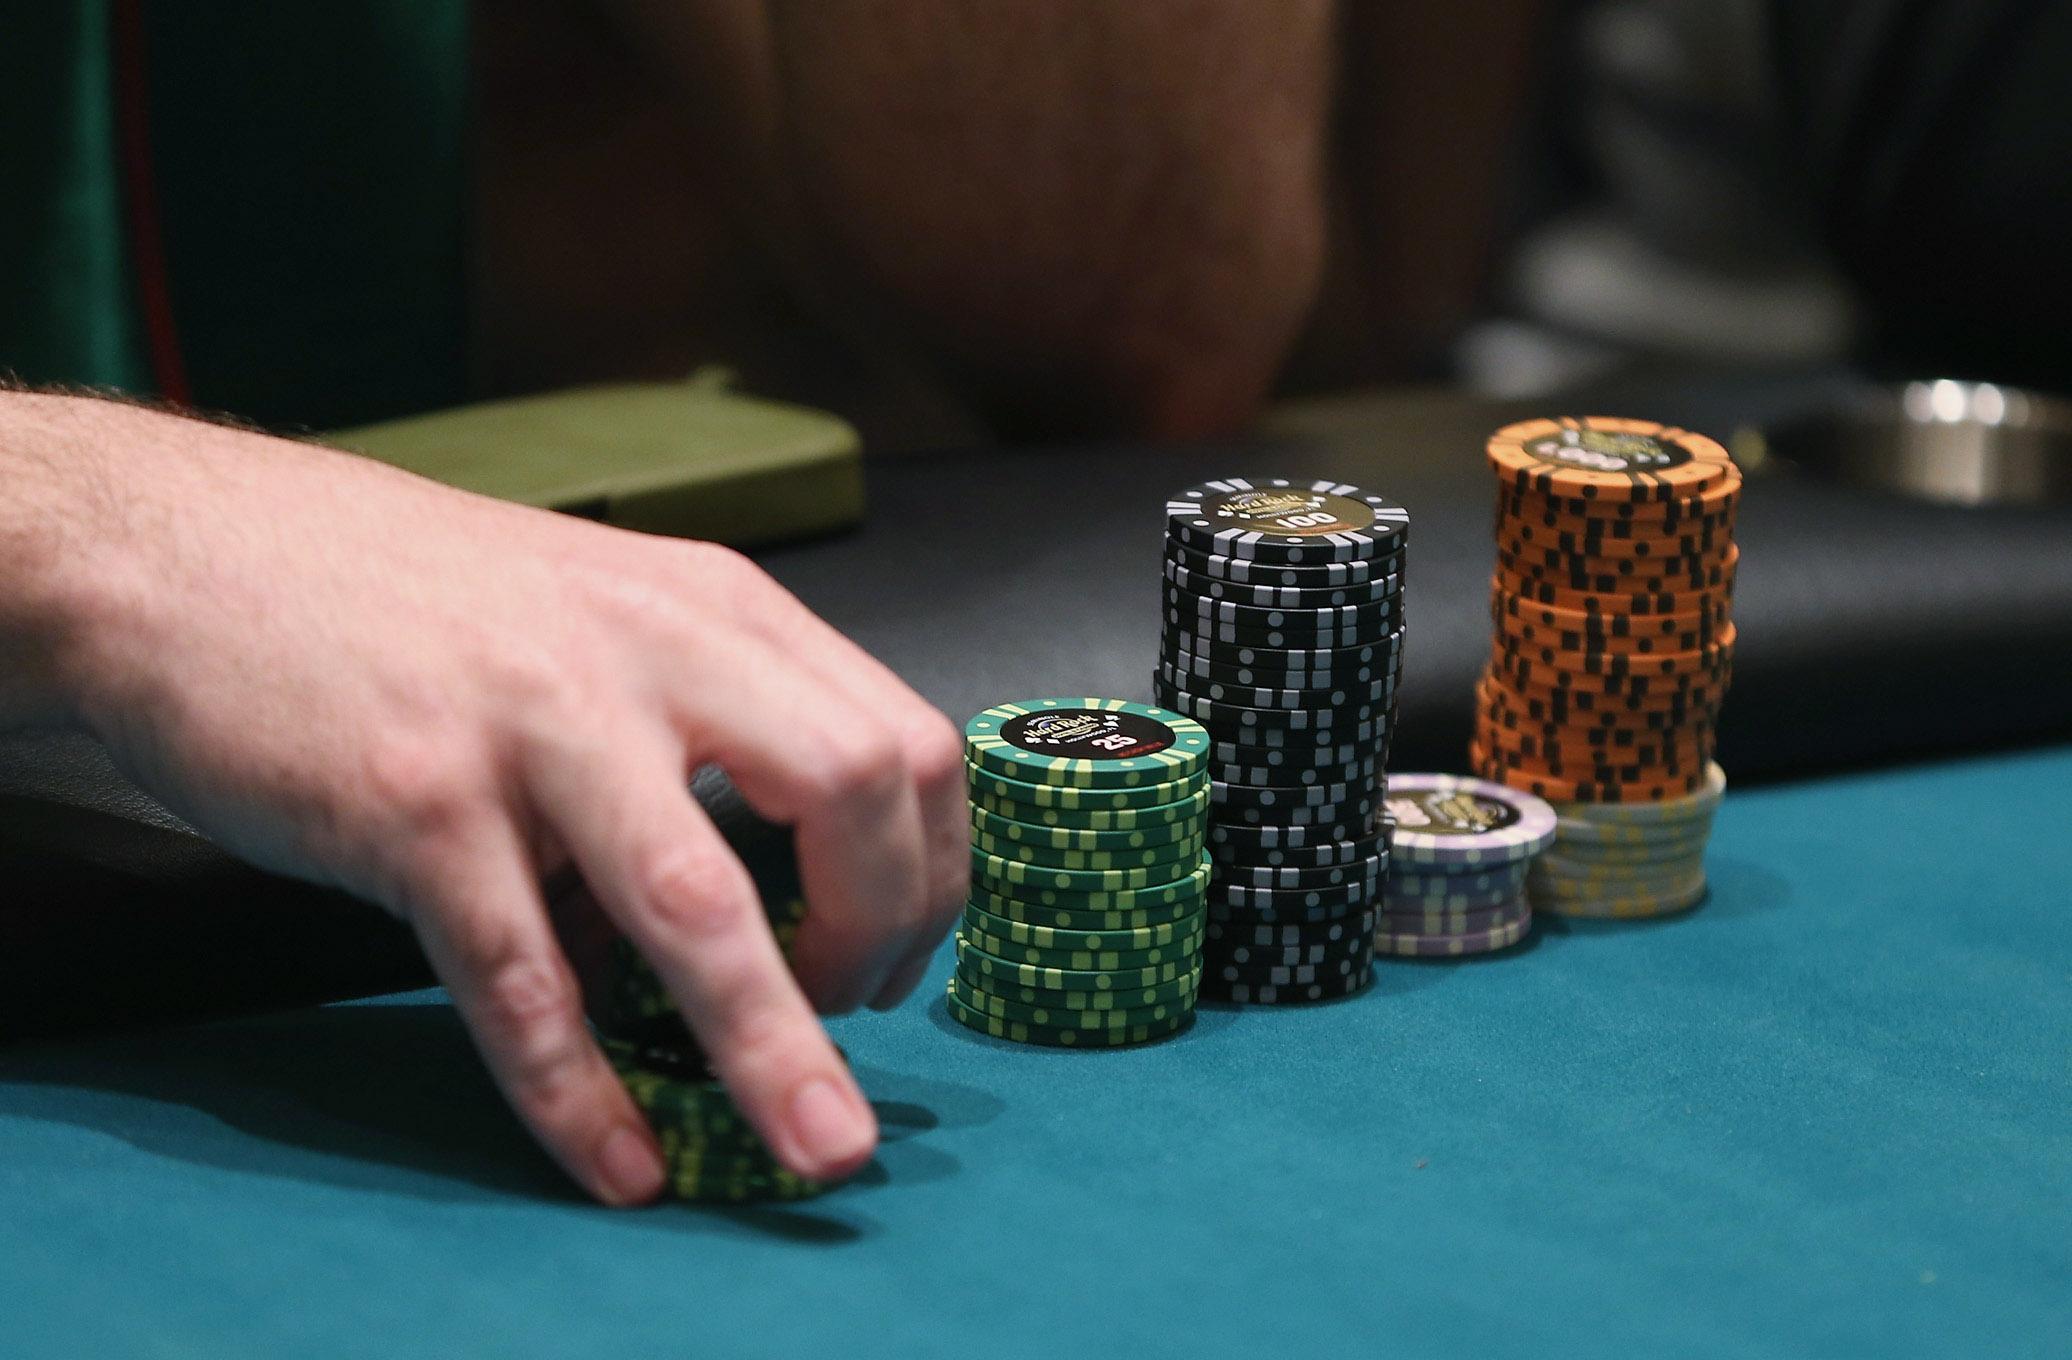 Hati-hati, opsi permainan poker terbaik menyadari kesalahan ini